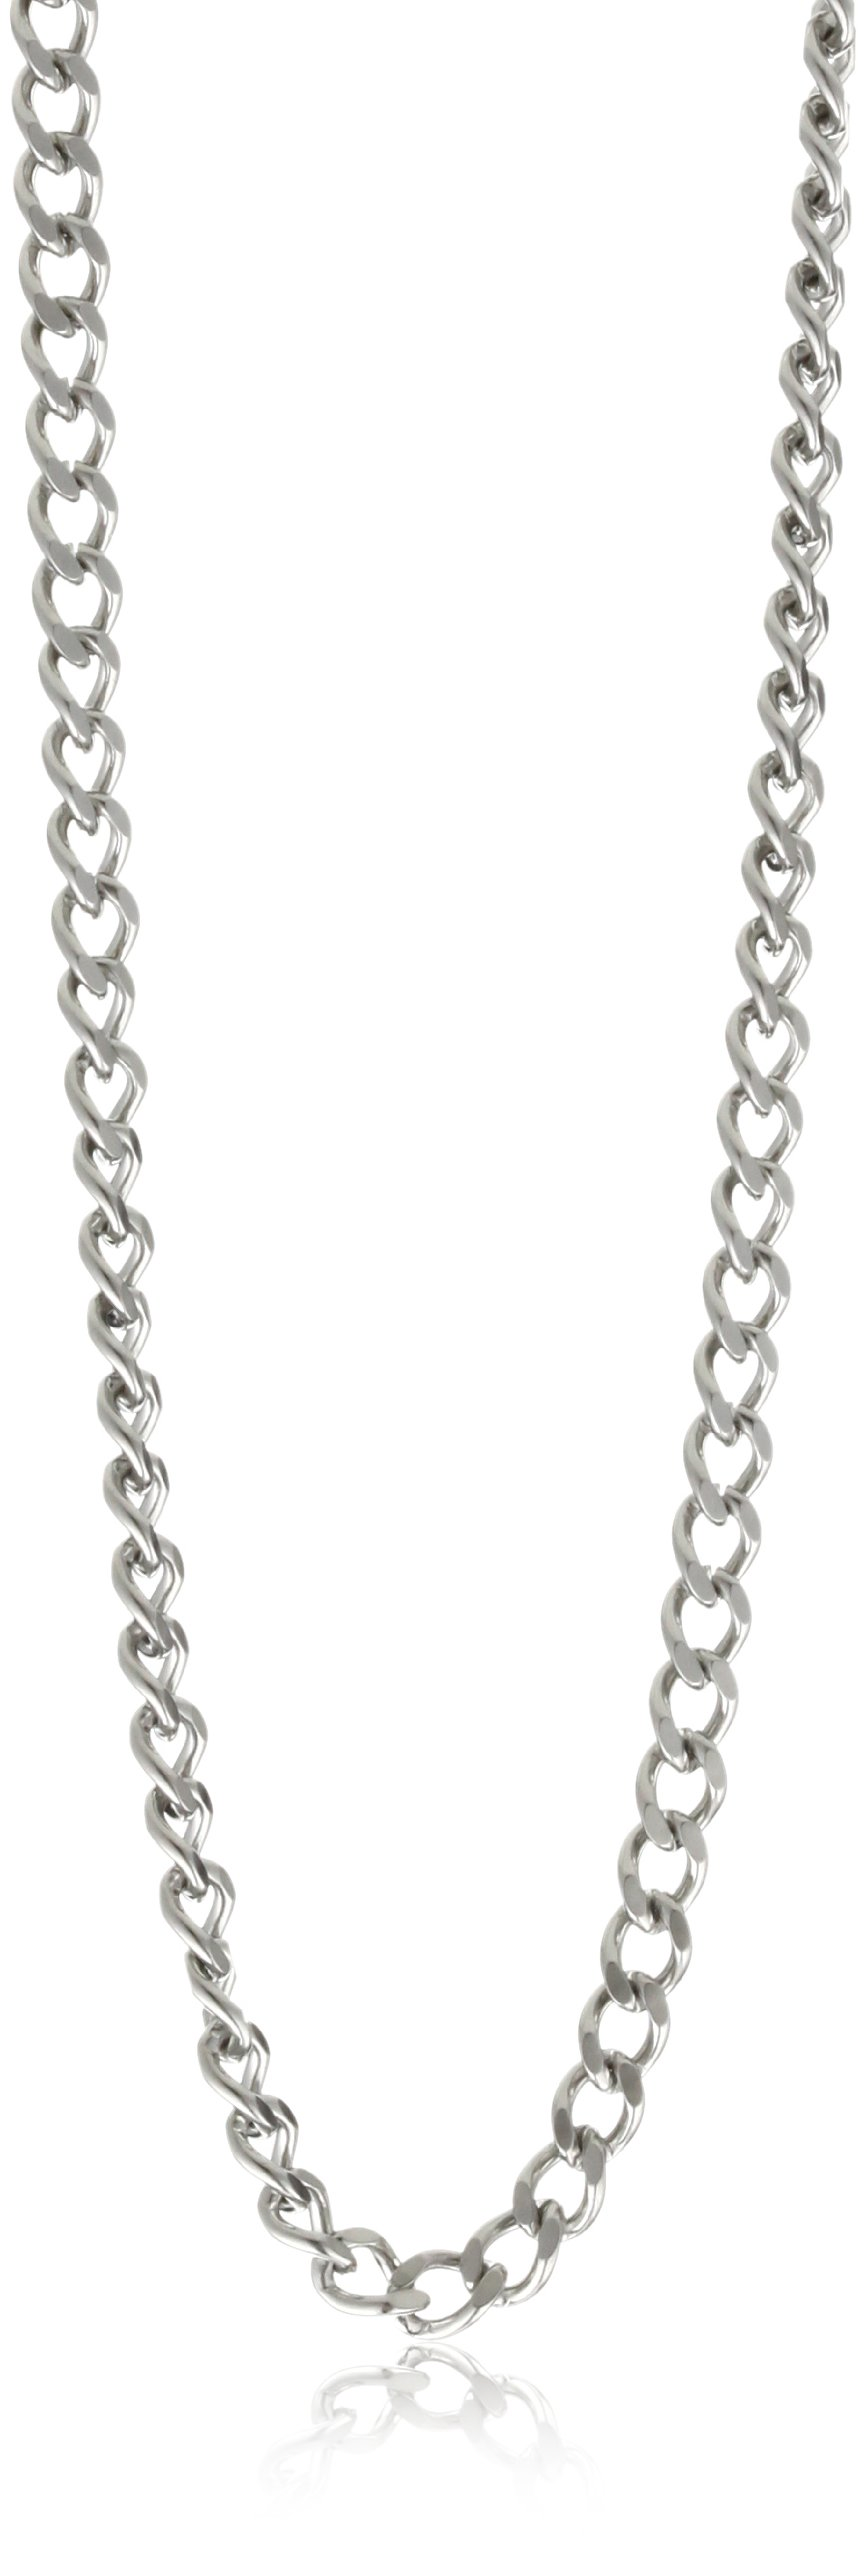 Charles-Hubert, Paris 3911-W Stainless Steel Pocket Watch Chain